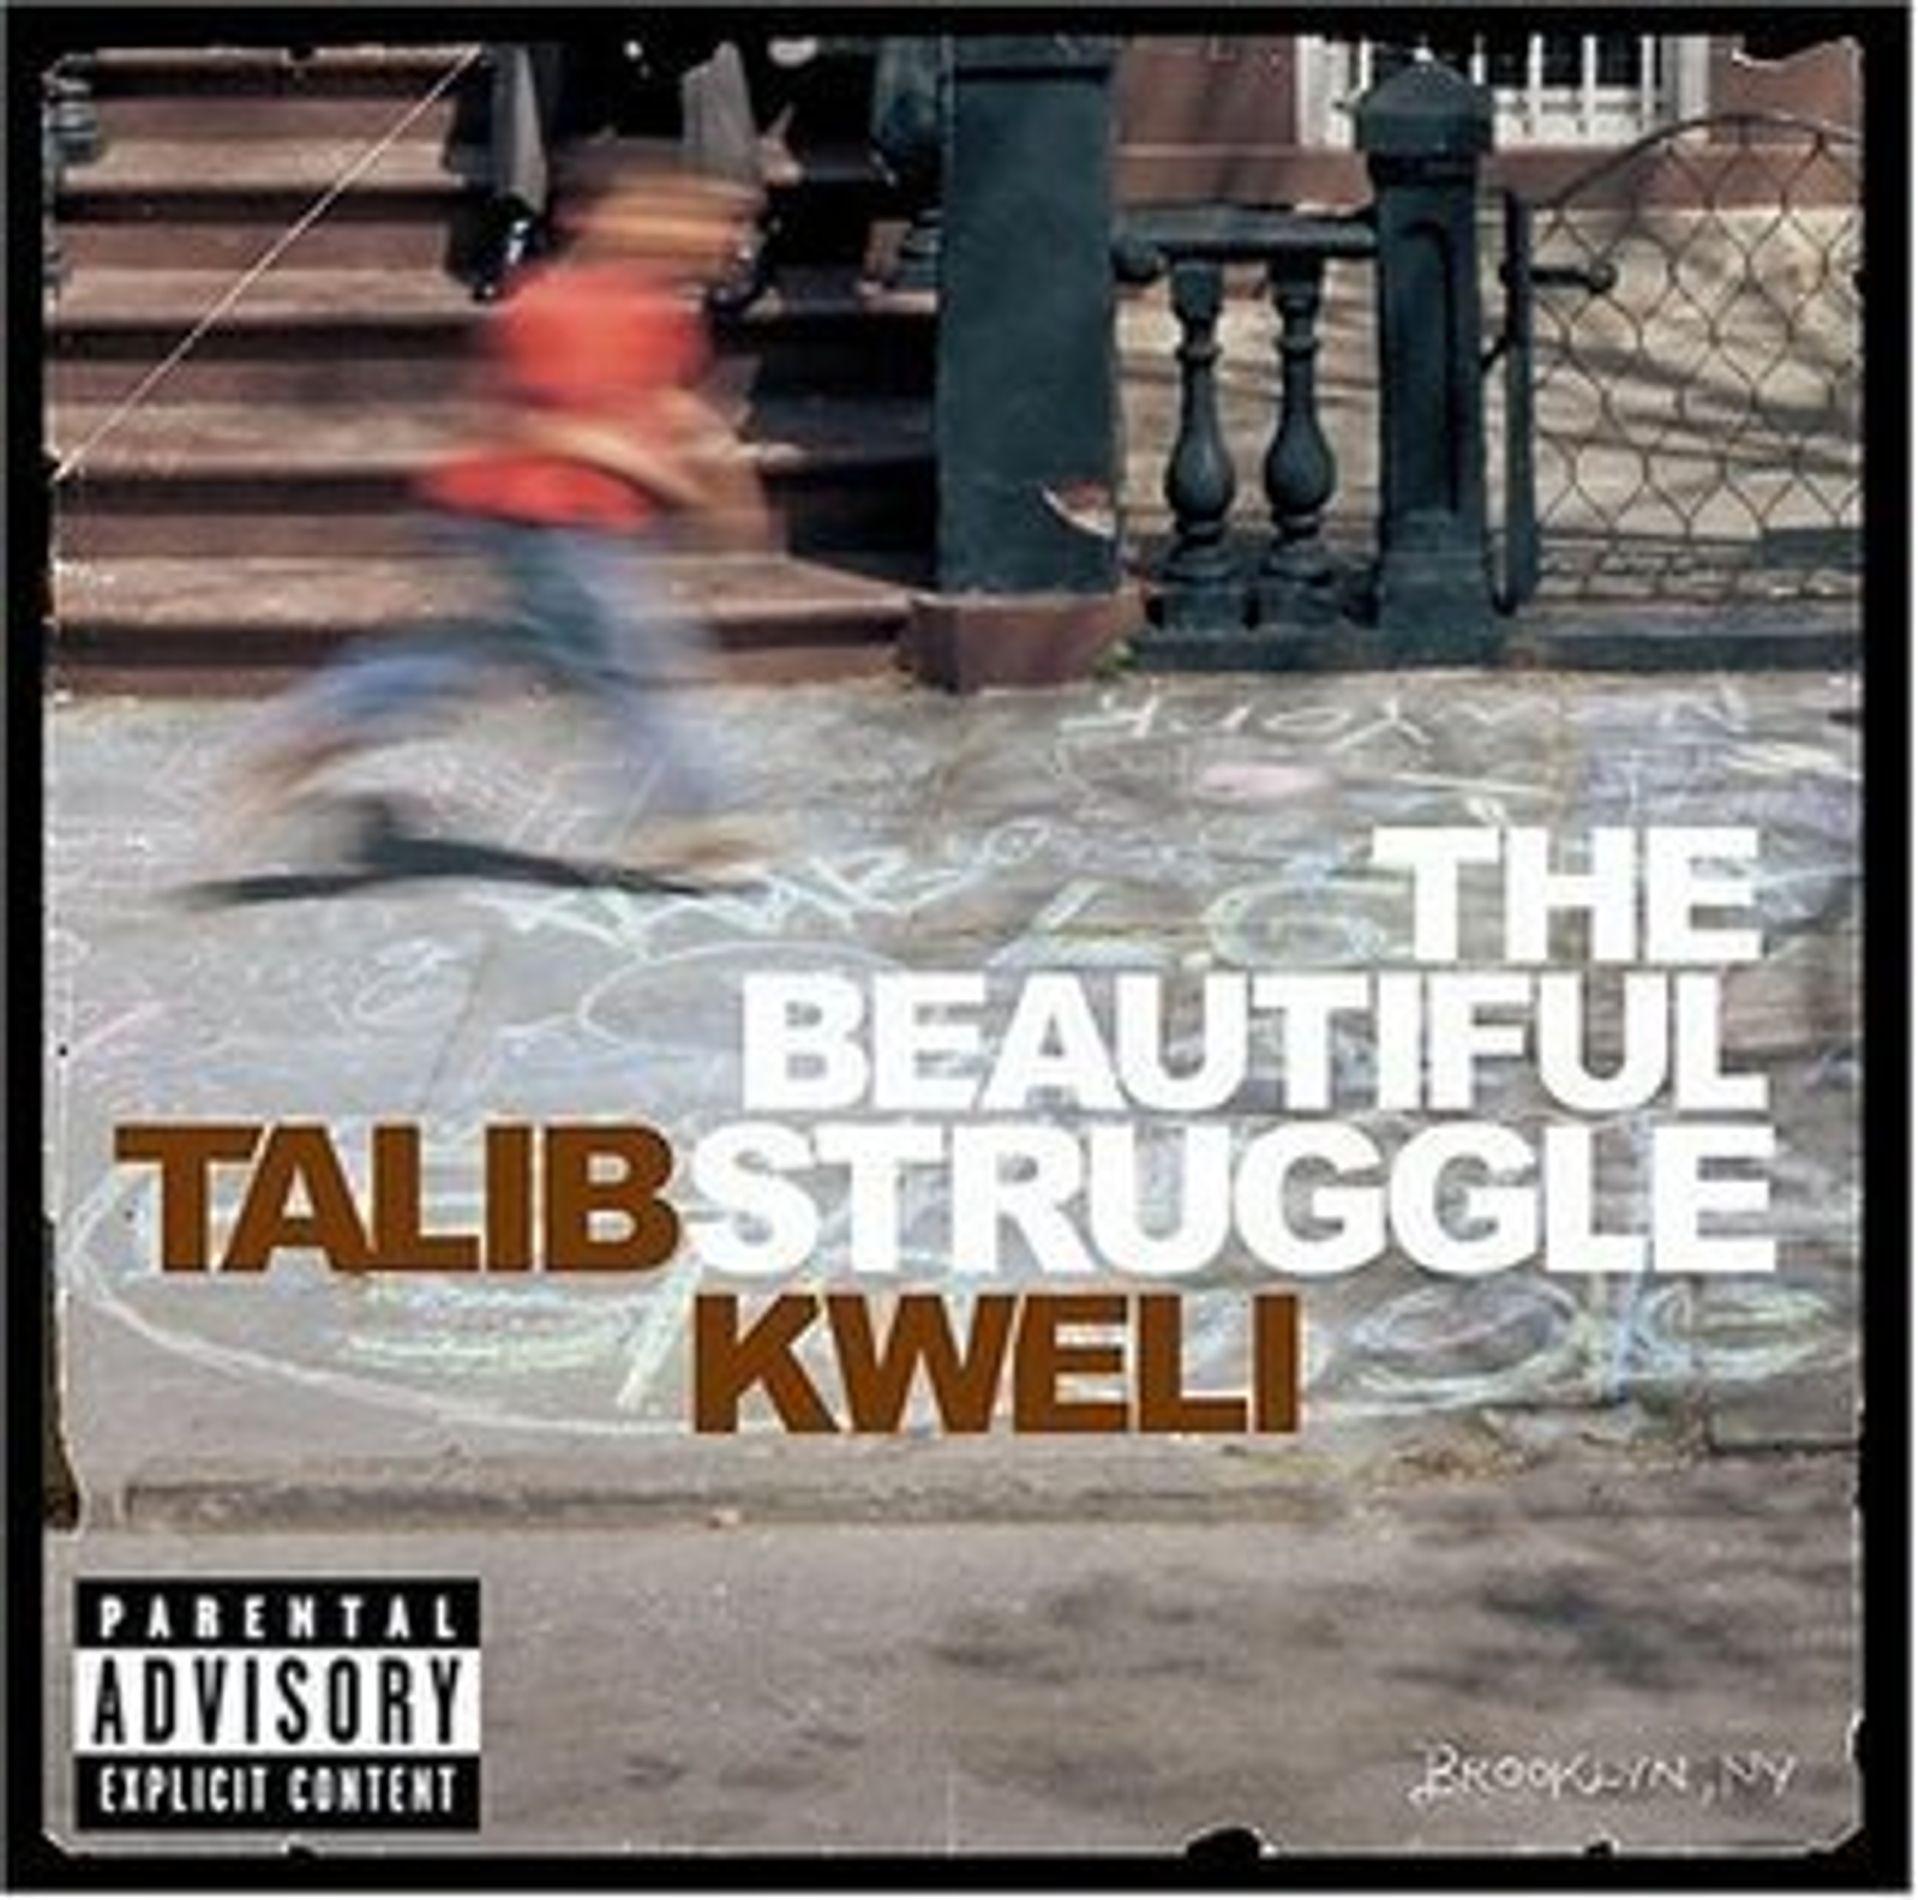 Album Title: The Beautiful Struggle by: Talib Kweli